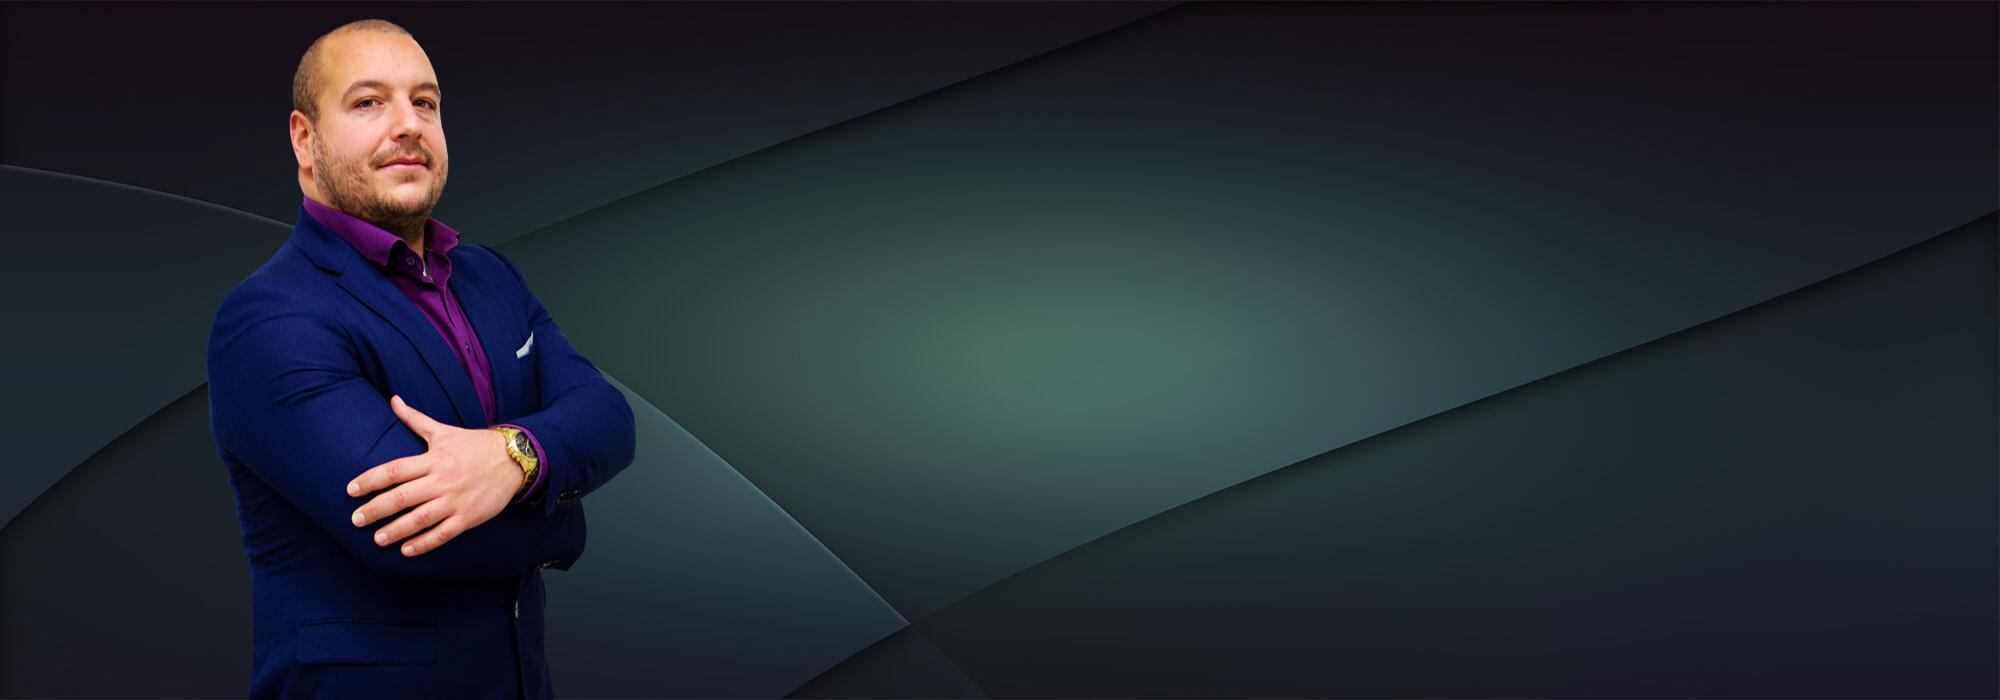 edyfinance-banner-2000×700-navrh-edo-02e